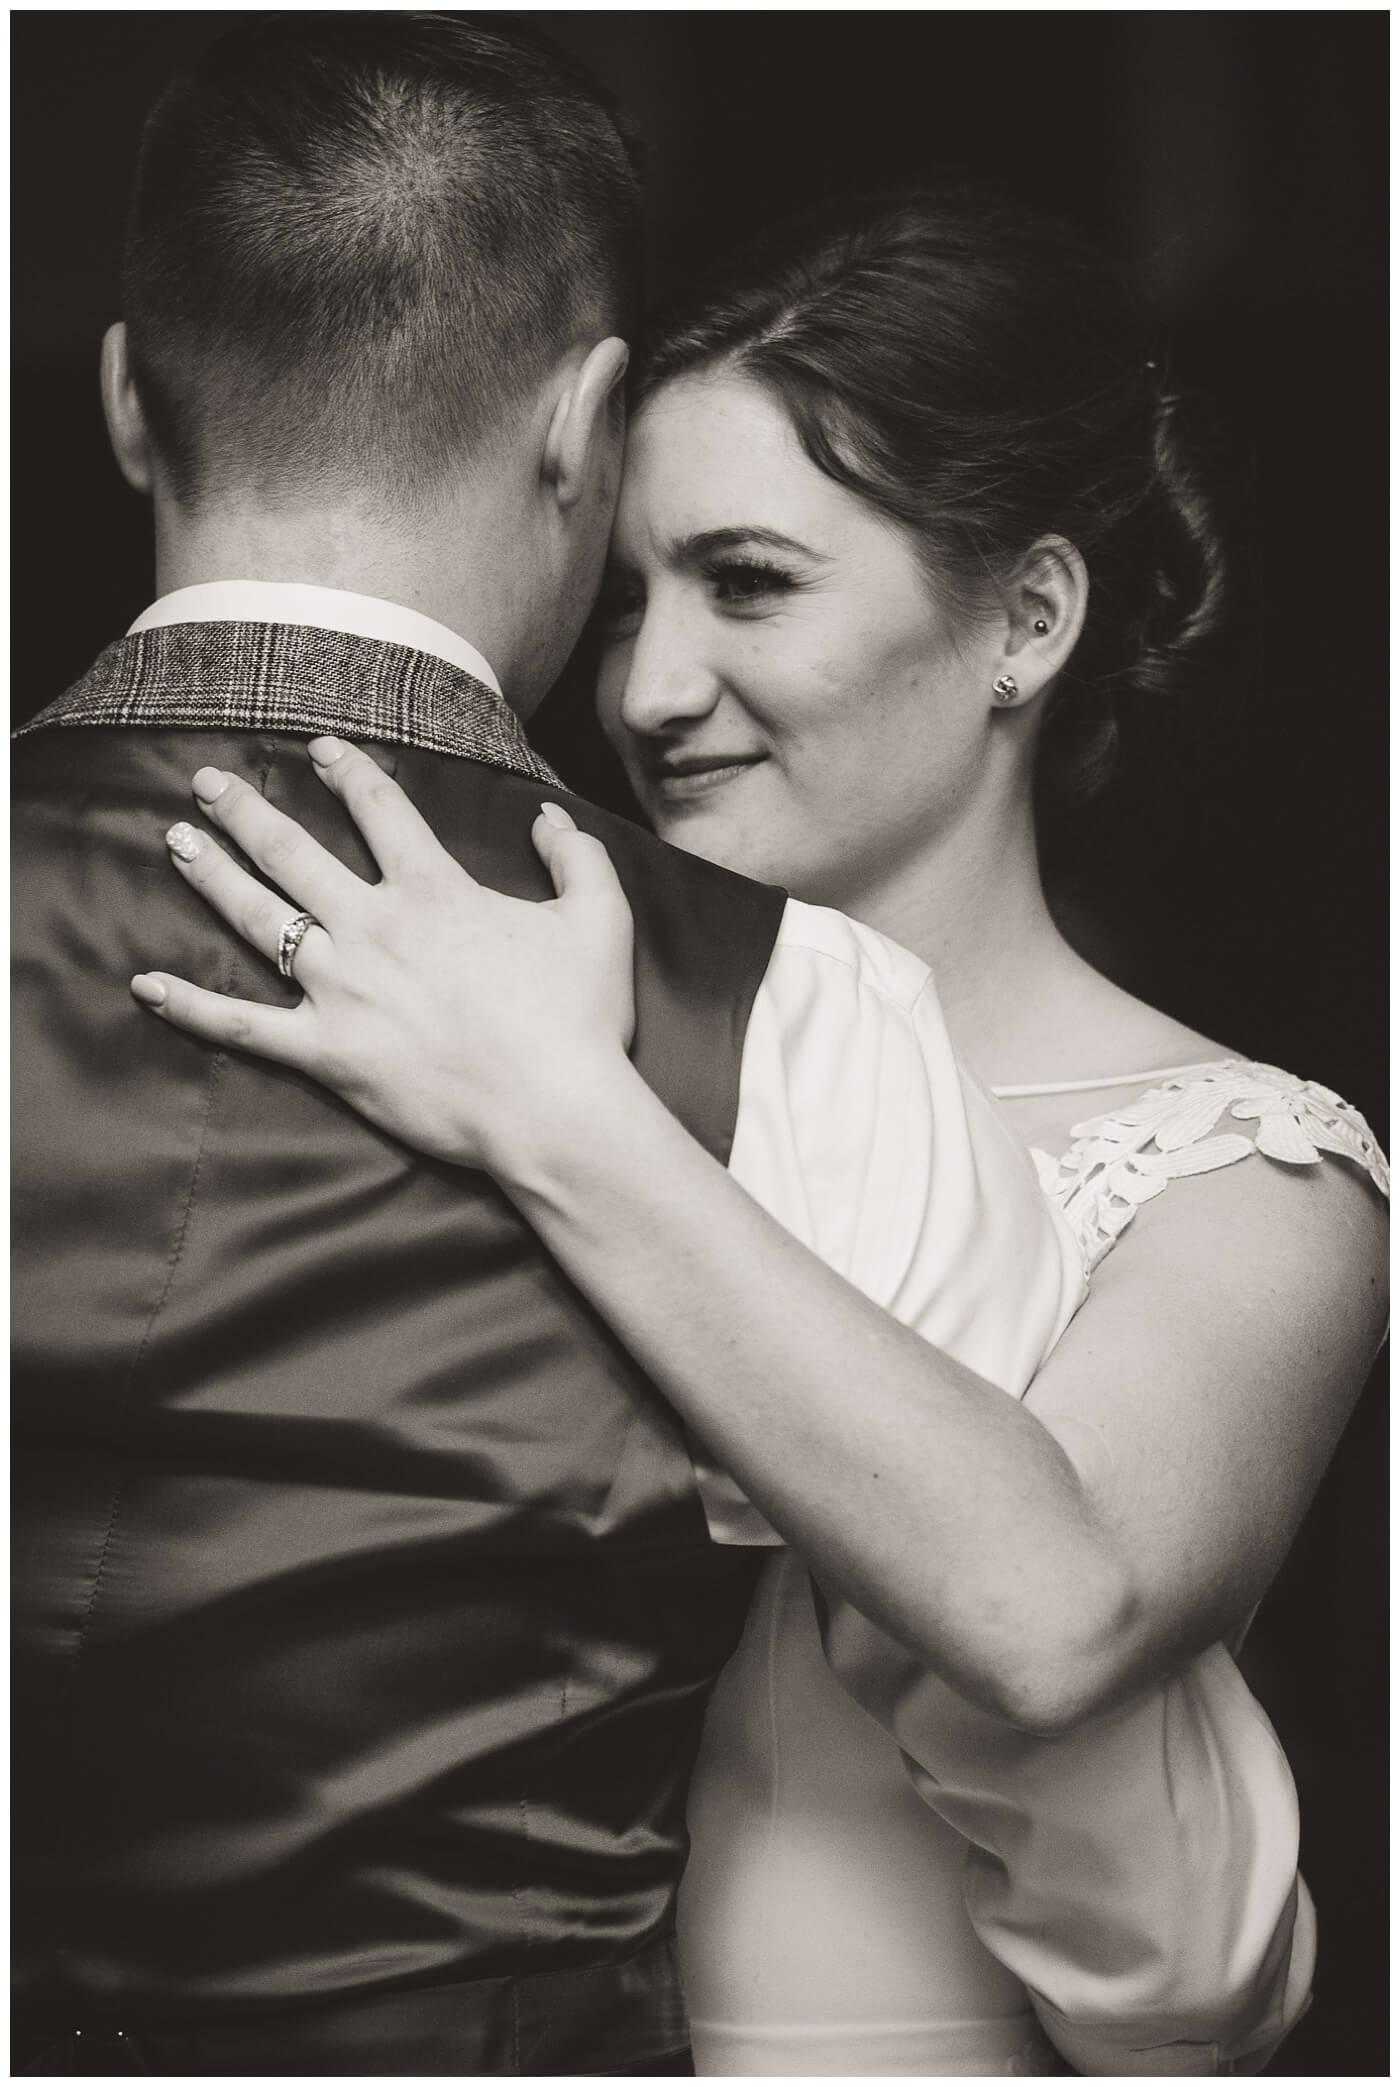 Mark & Kyra - Wedding - 21 - Kyra - Bride & Groom First Dance